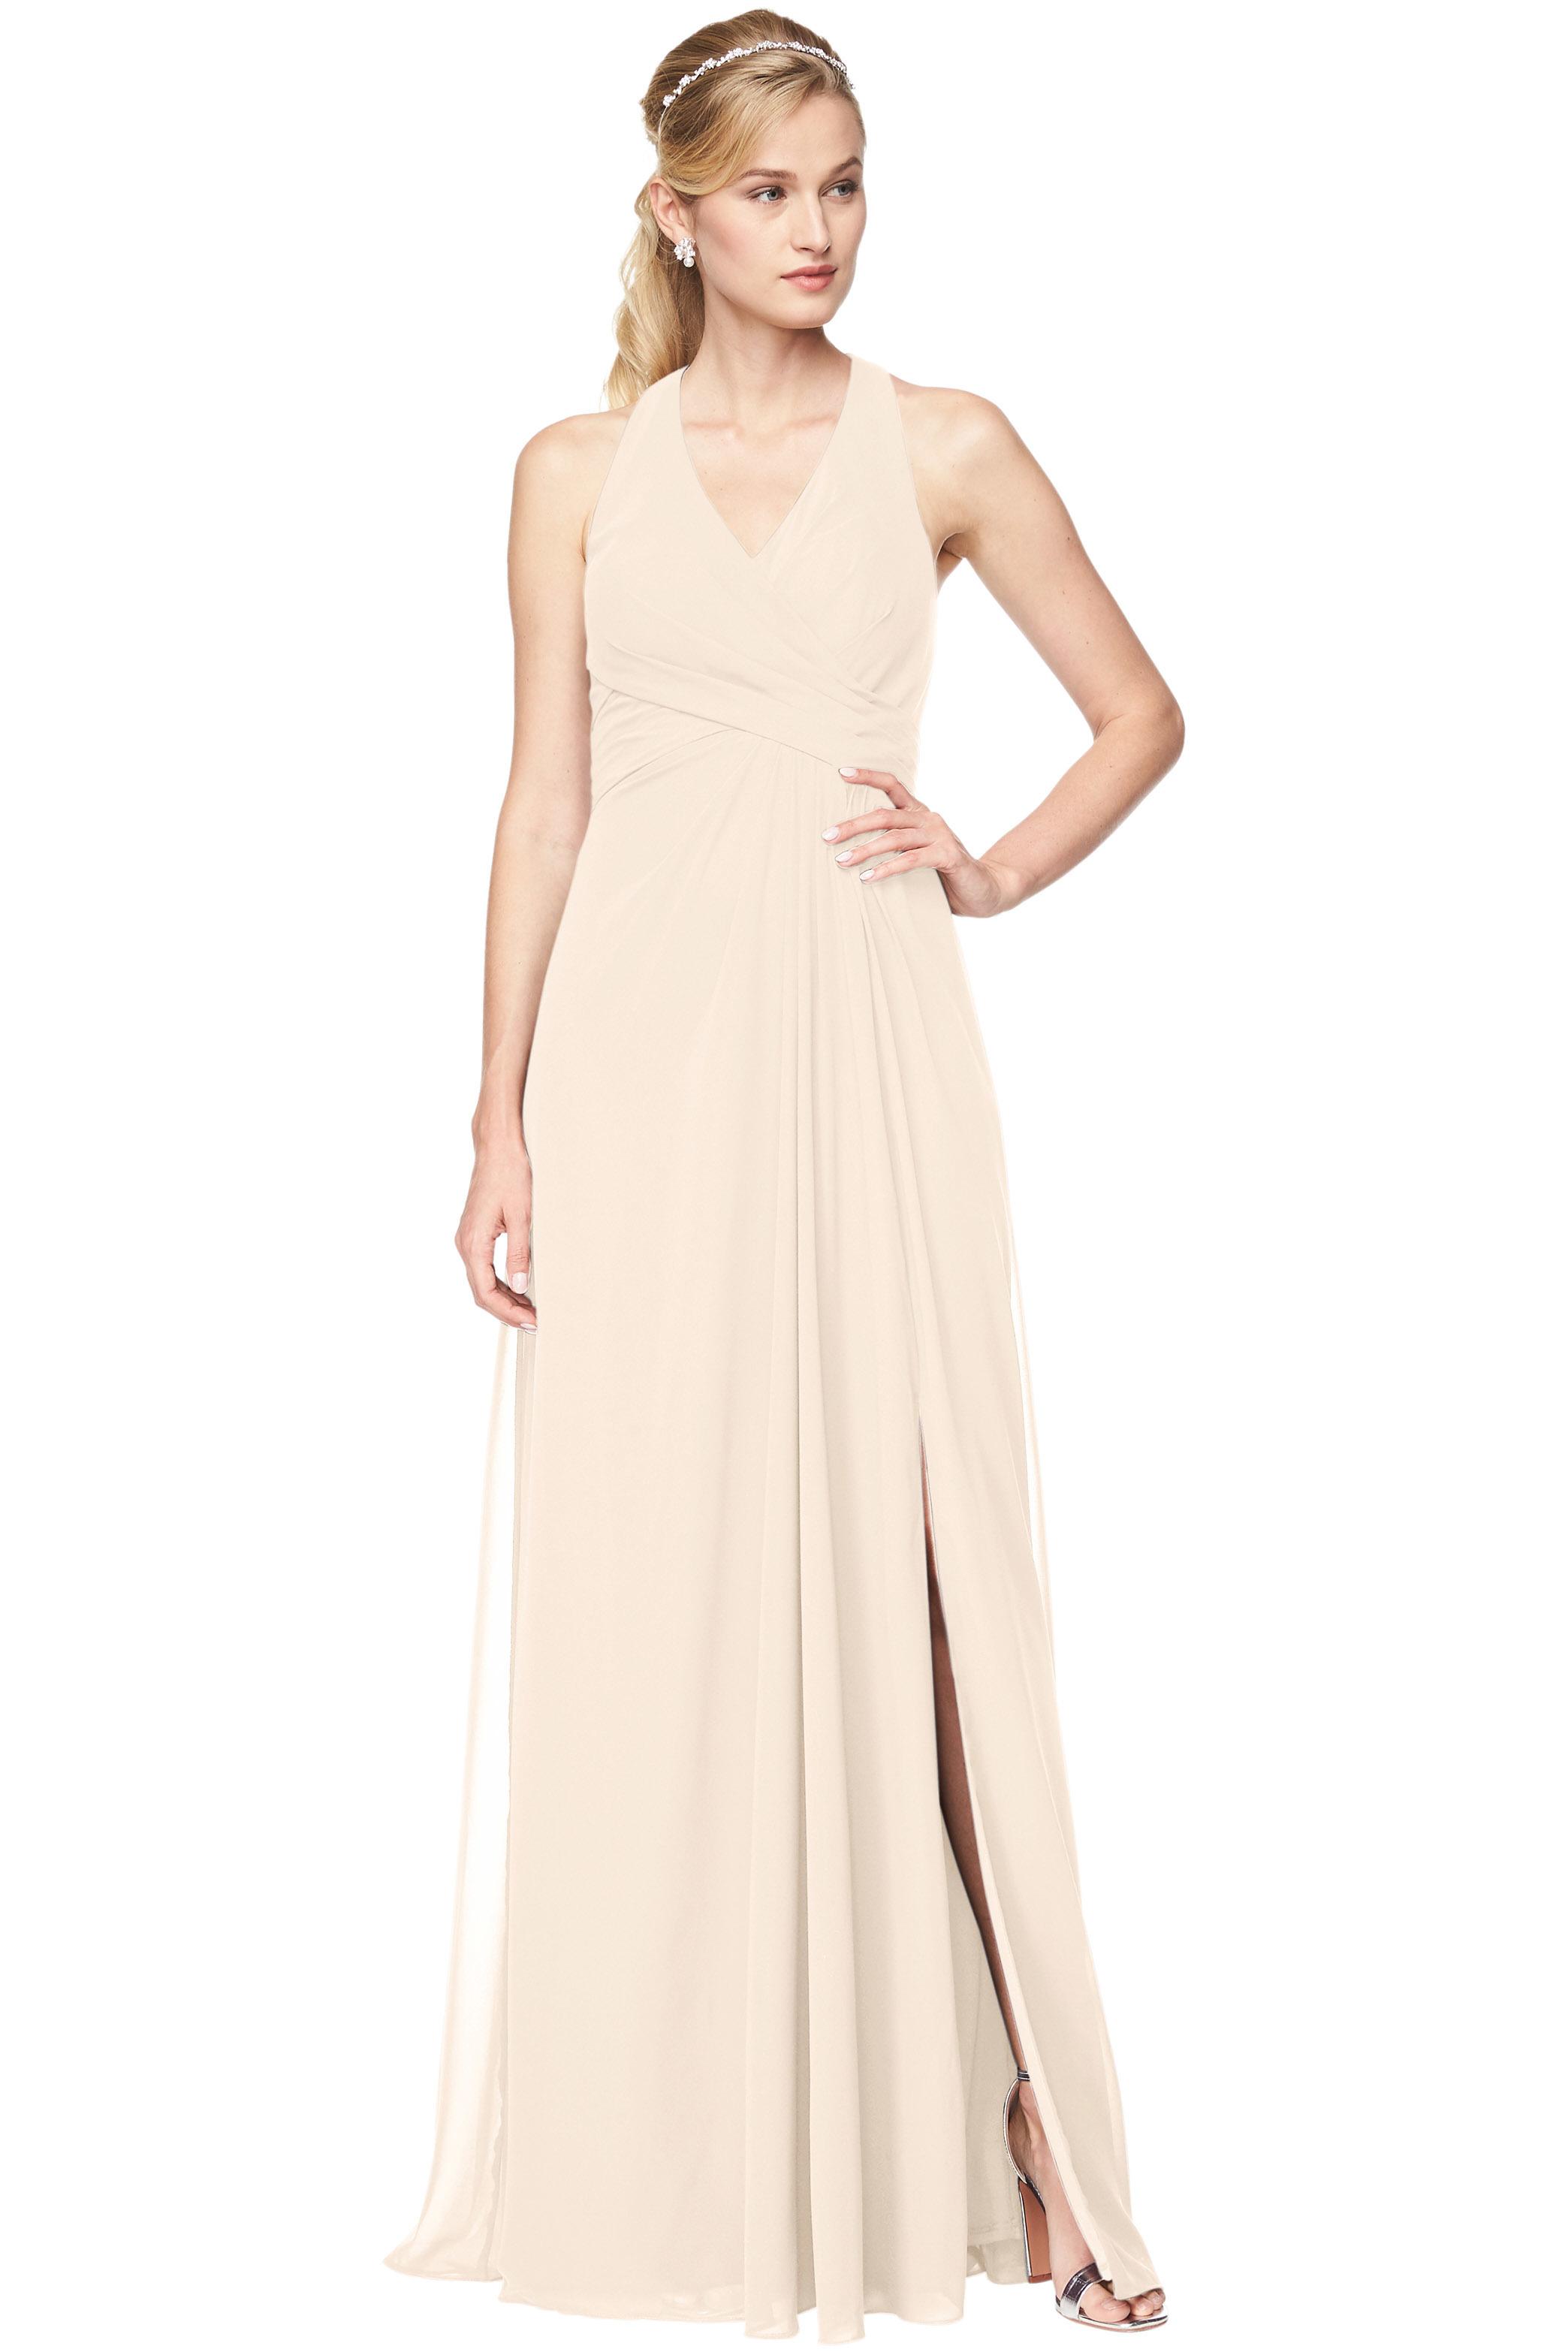 Bill Levkoff IVORY Chiffon V-Neck, Halter A-Line gown, $198.00 Front